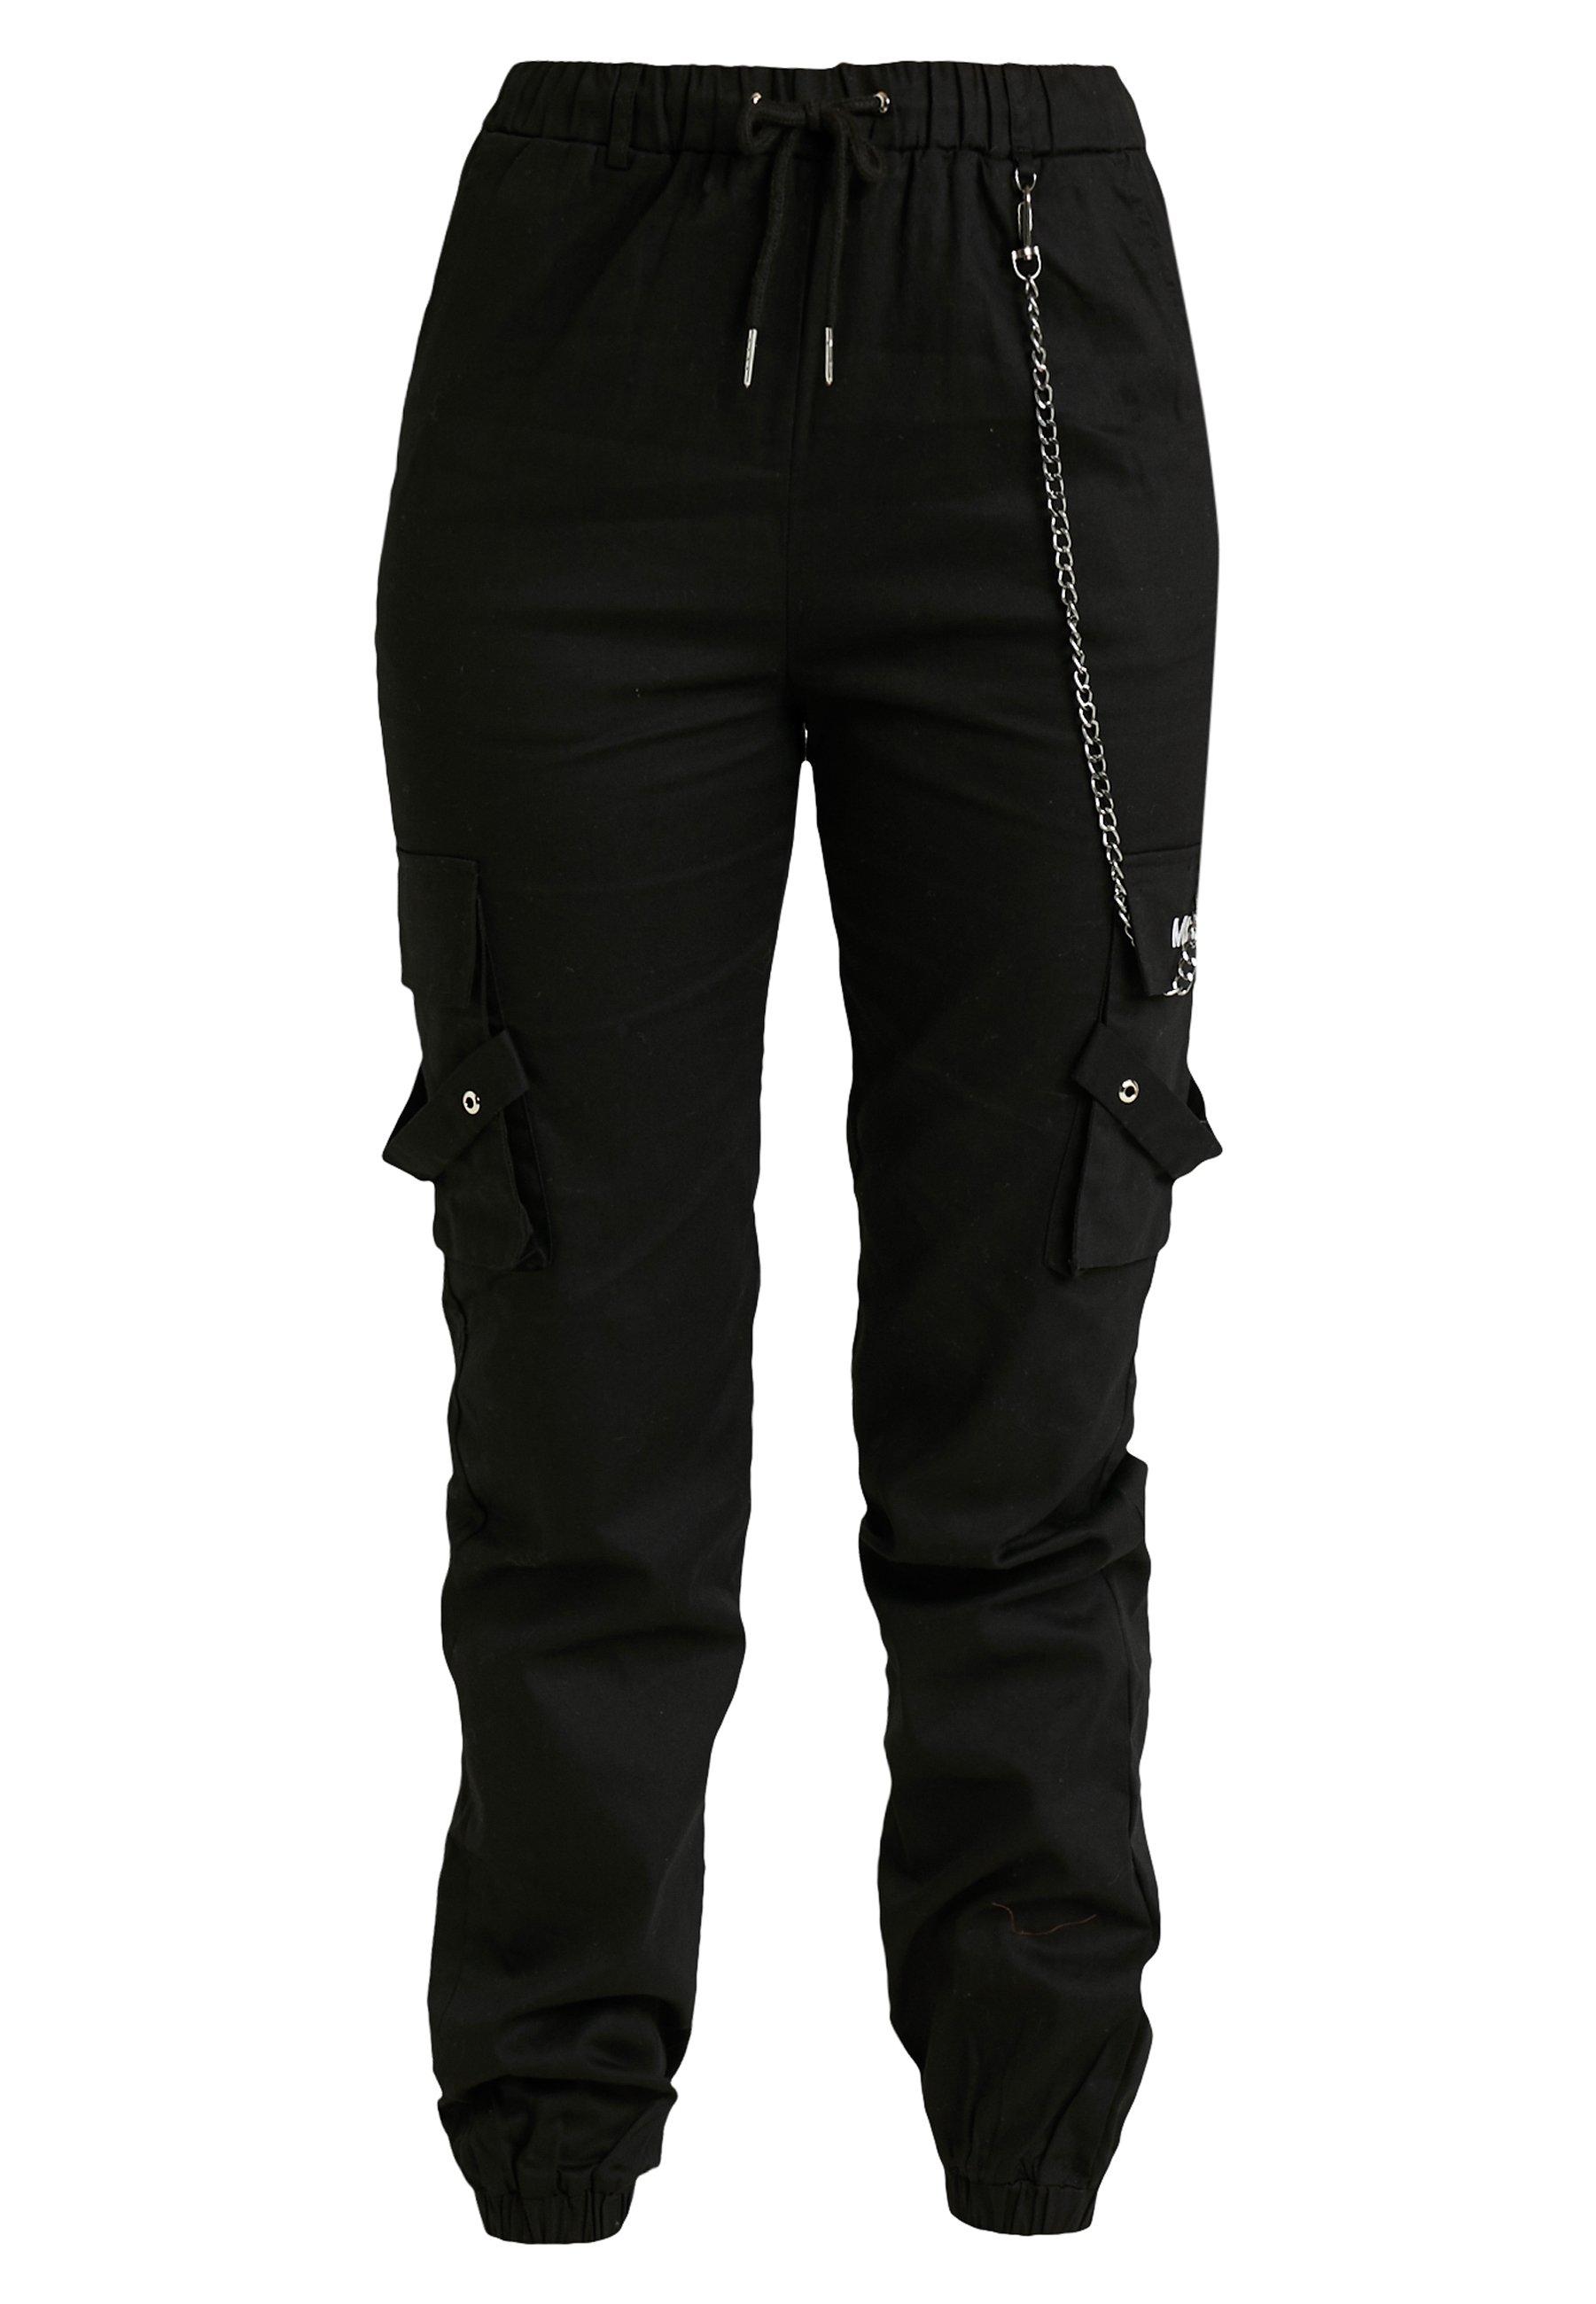 Femme EMBROIDERED CHAIN - Pantalon classique